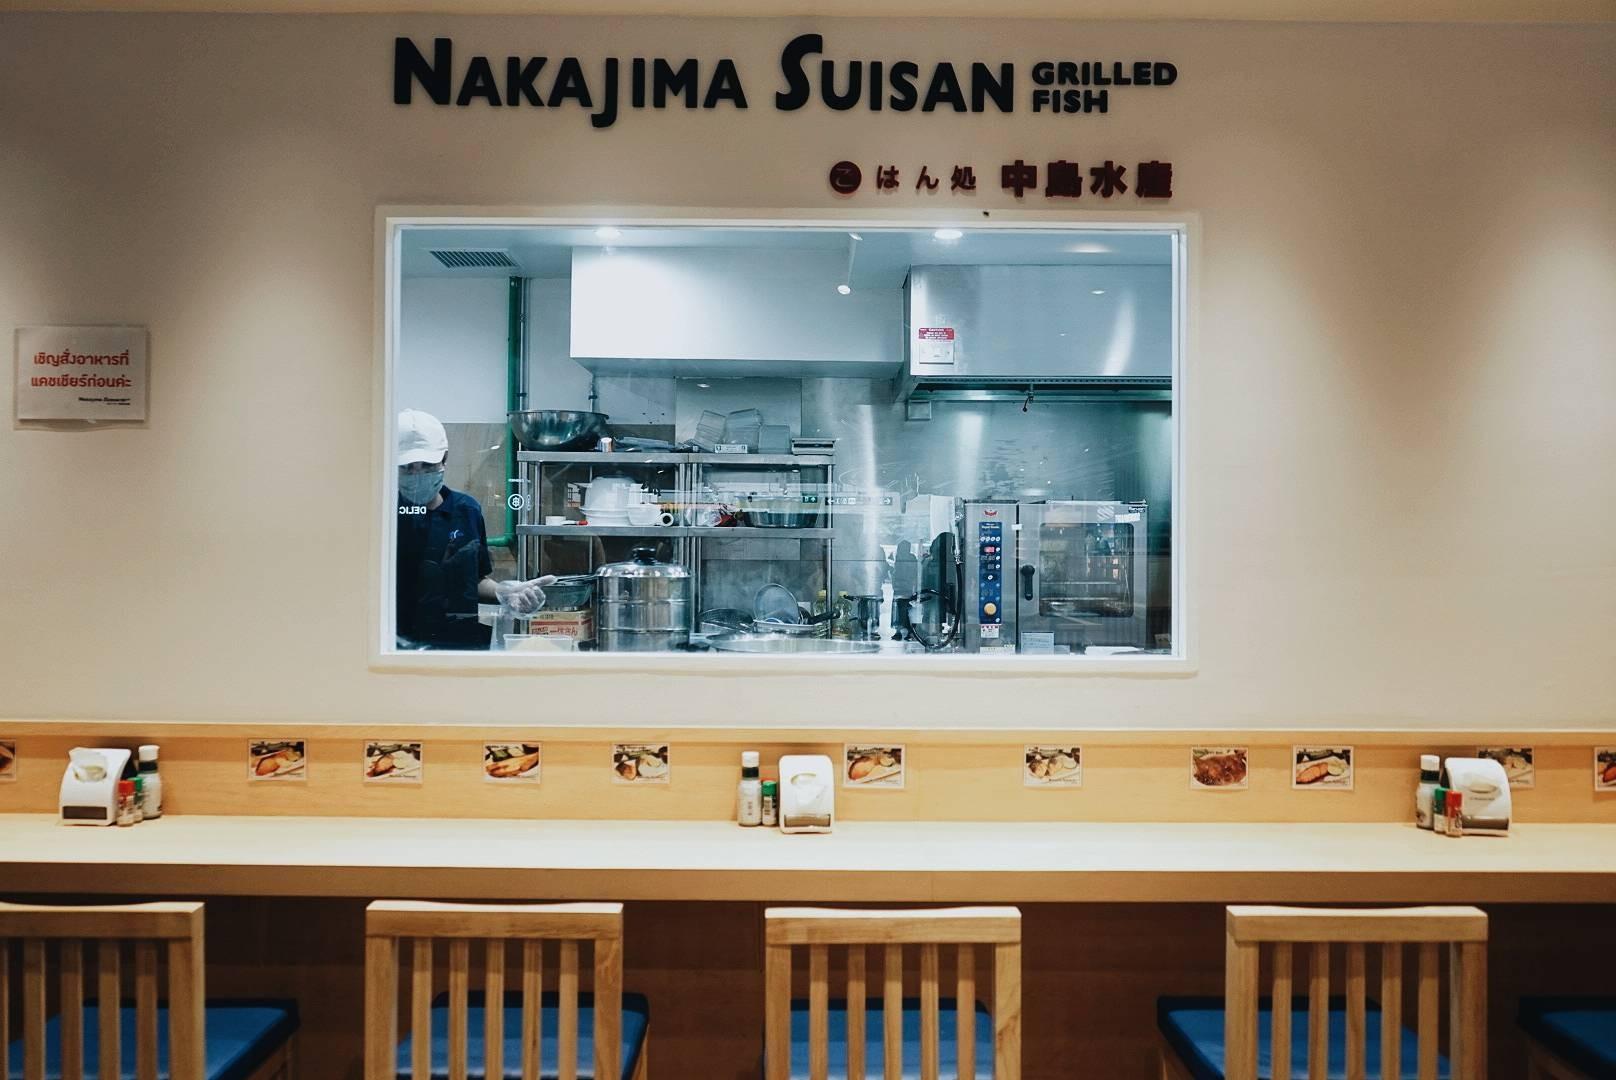 Nakajima Suisan